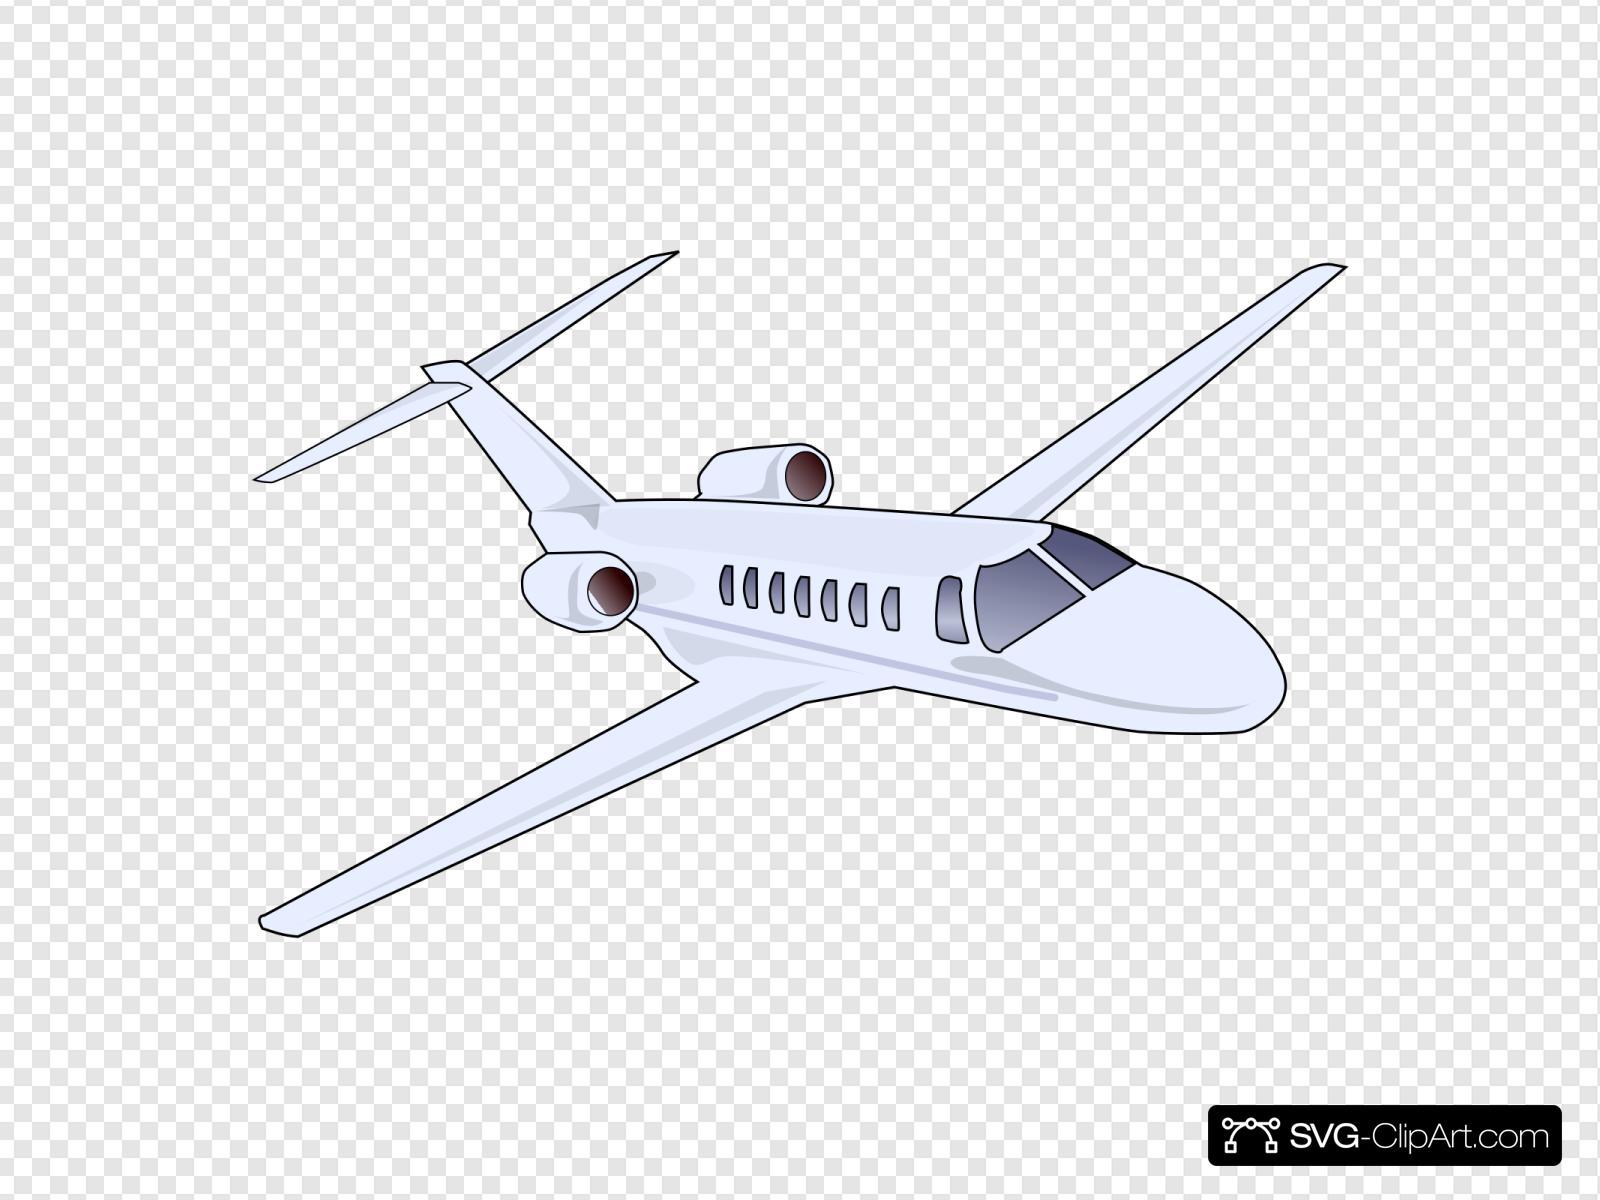 Aircraft Svg Vector Aircraft Clip Art Svg Clipart